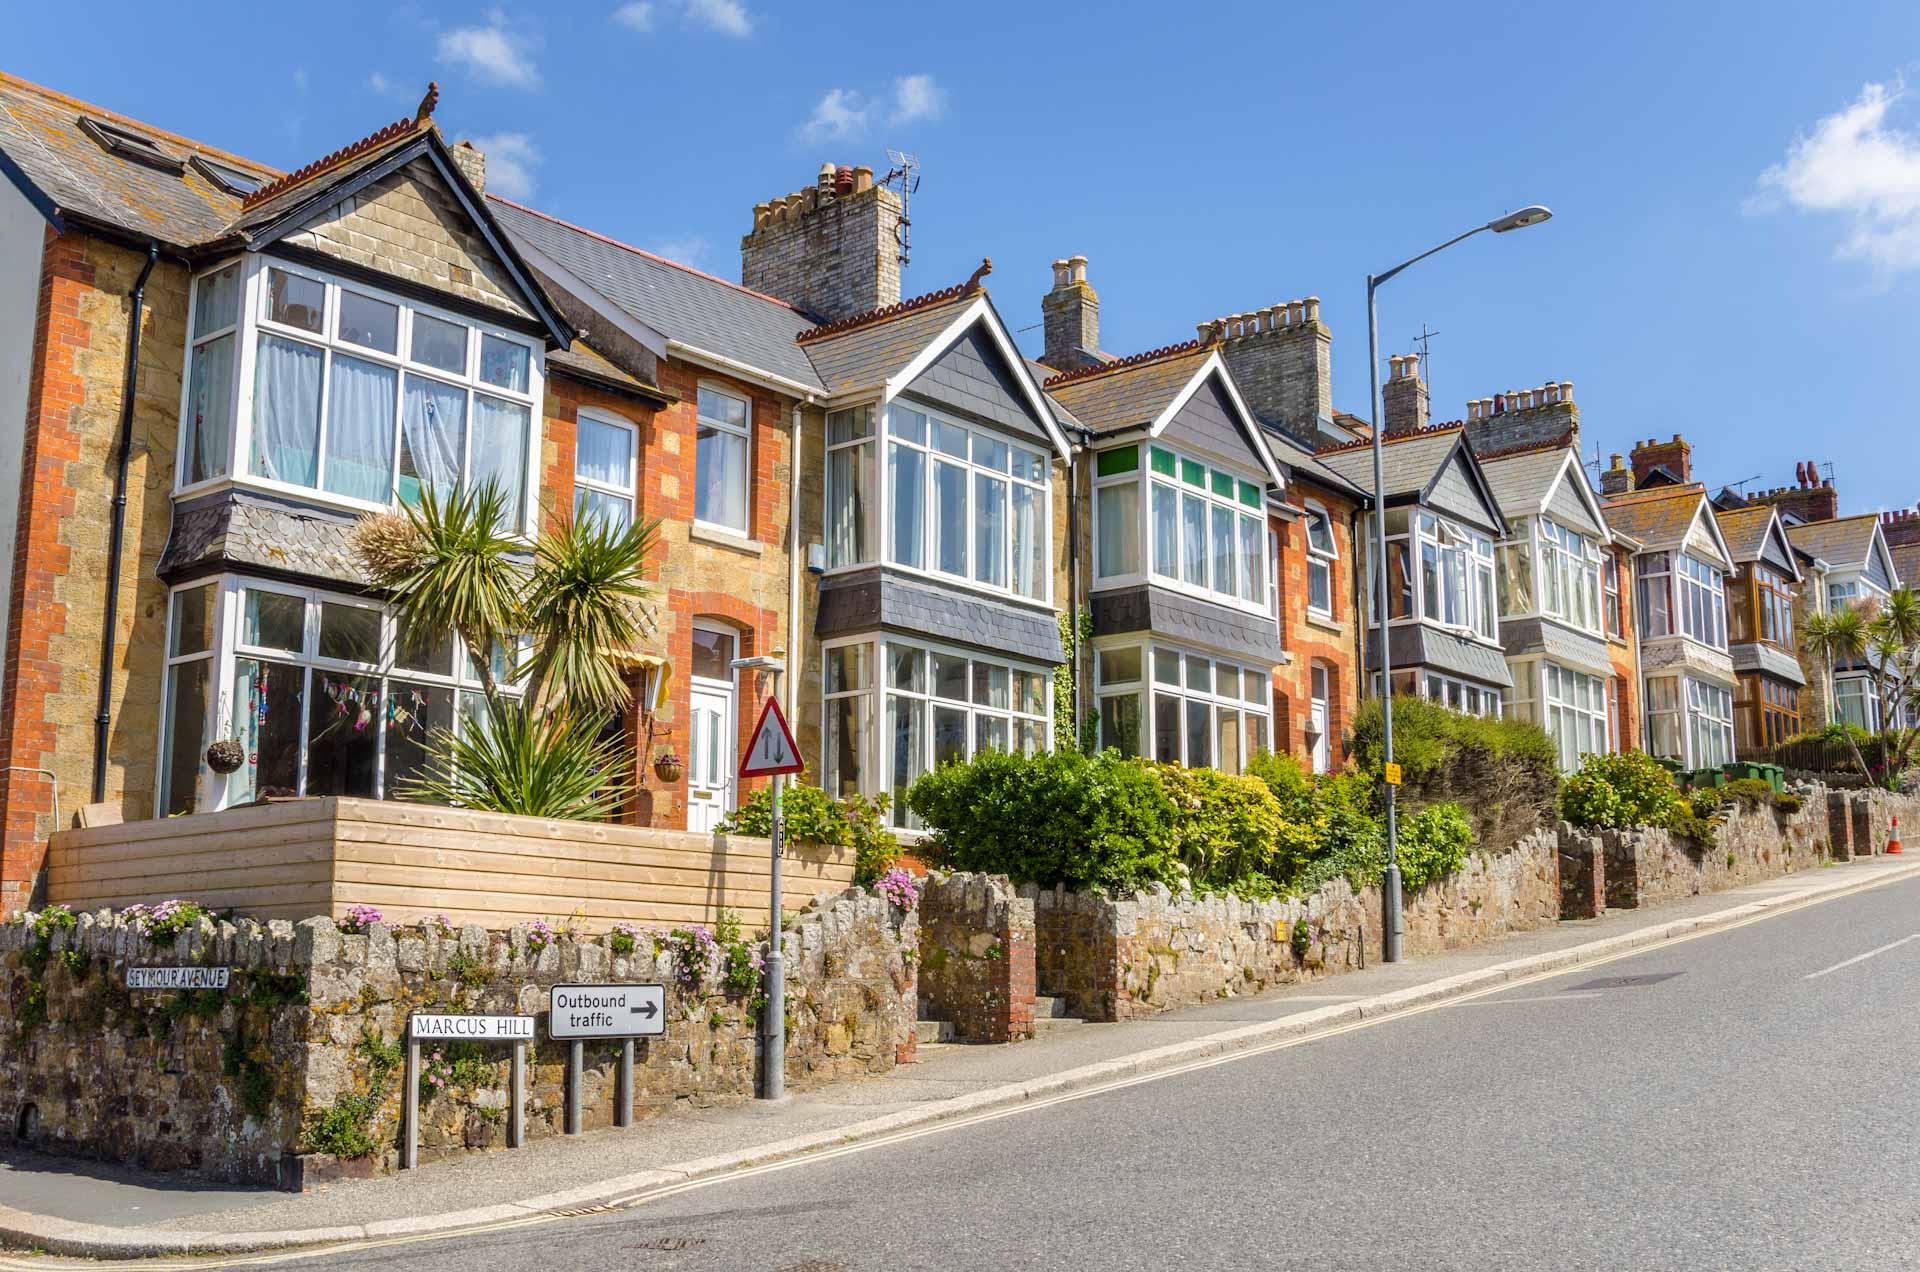 Despite Brexit, property prices rise in UK